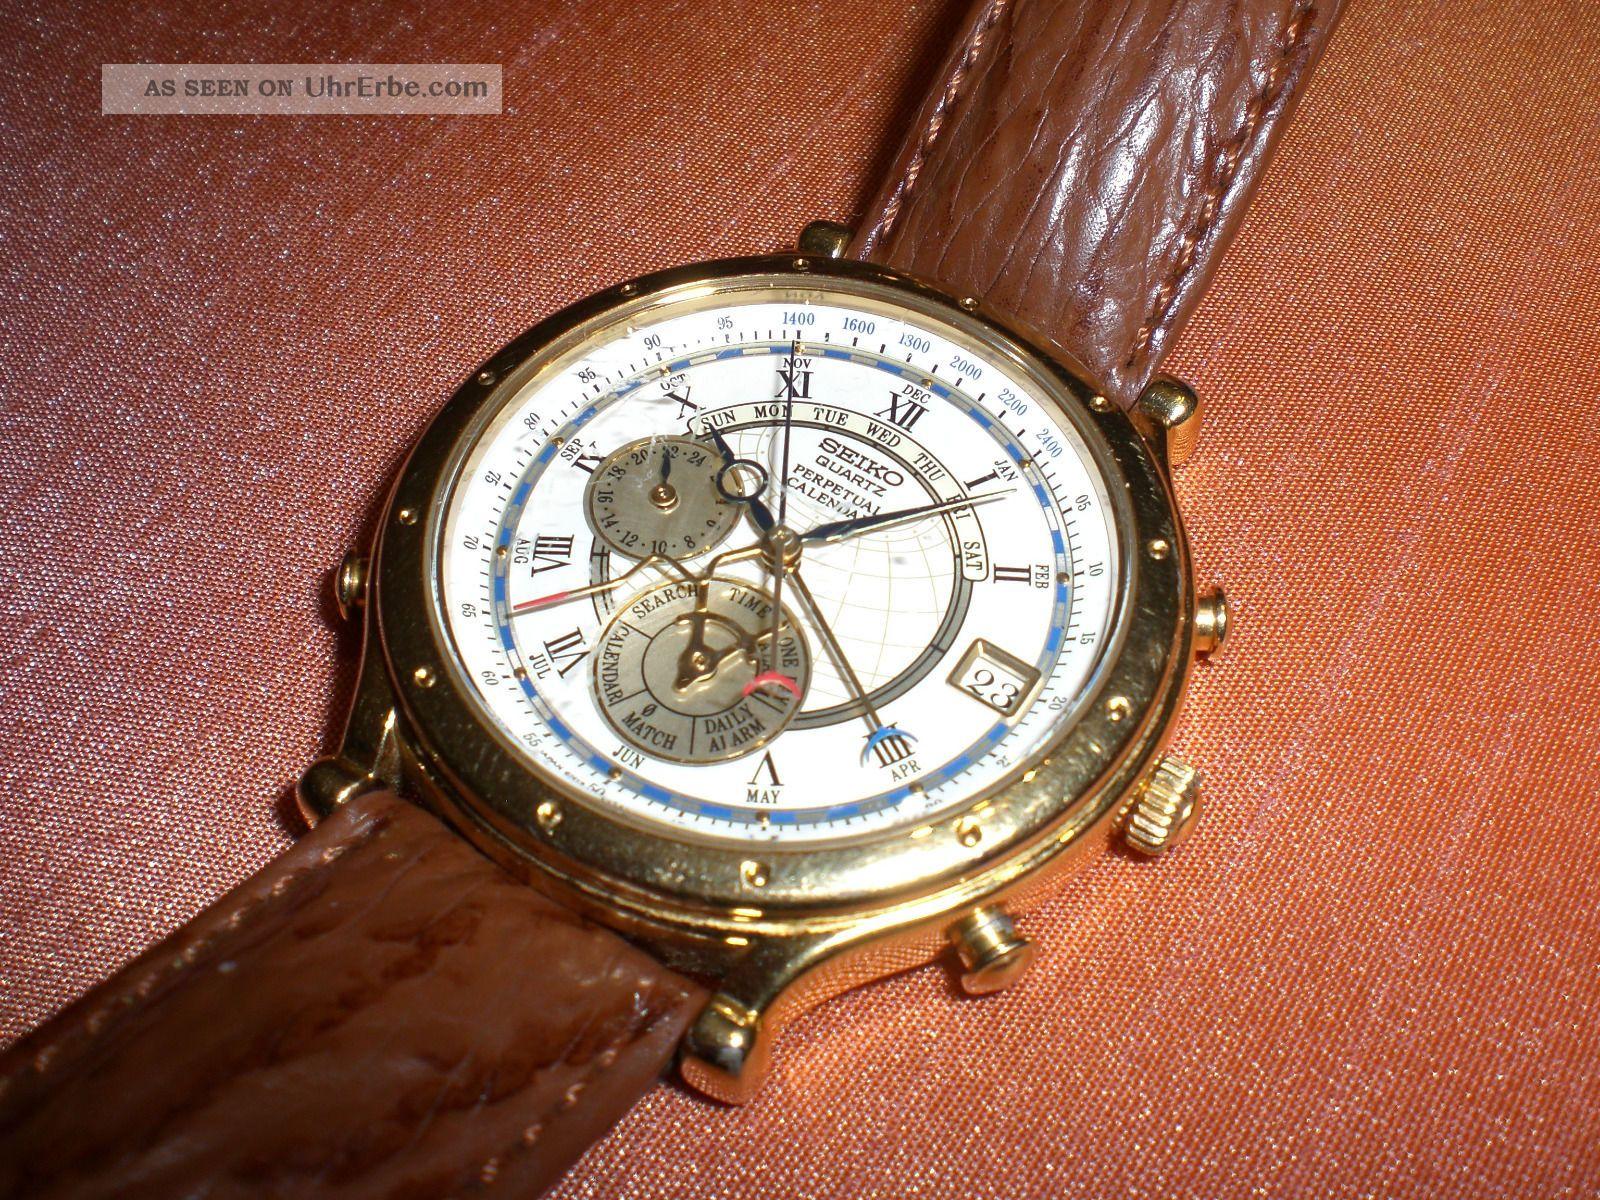 Seiko Perpetual Calendar Vintage : Seiko age of discovery quartz sammler armbanduhr m